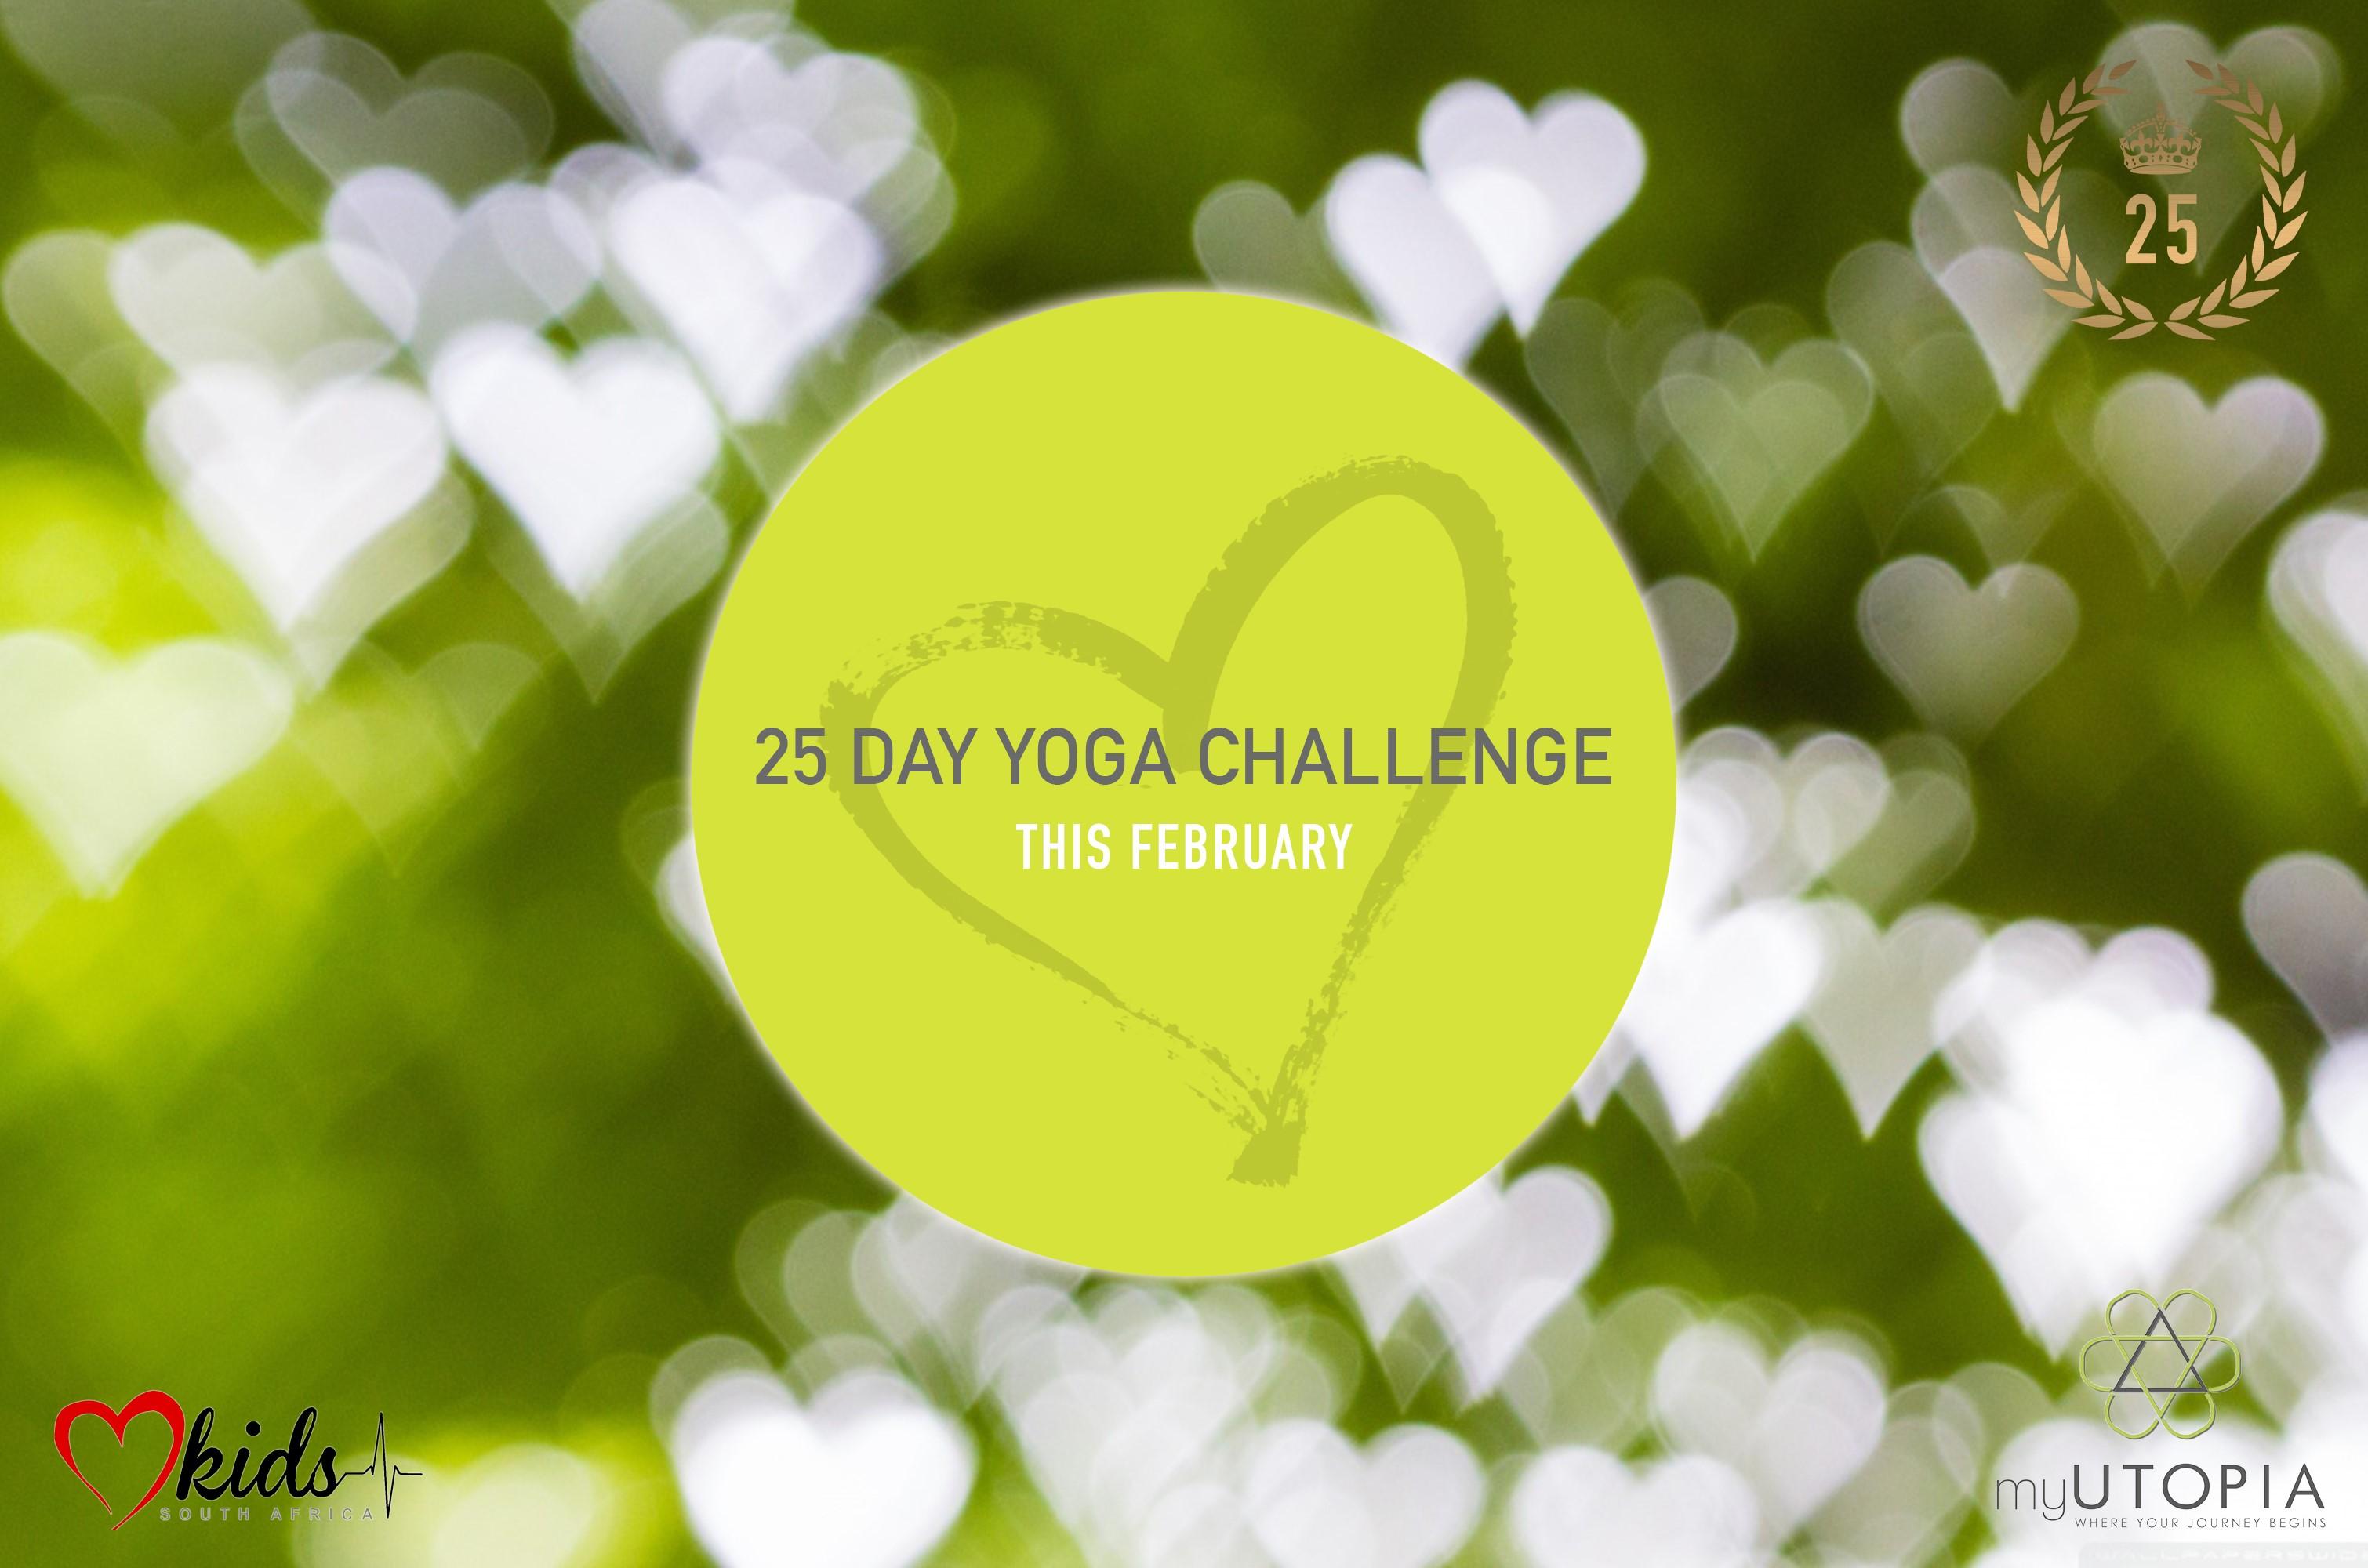 25-Day Challenge at myUTOPIA